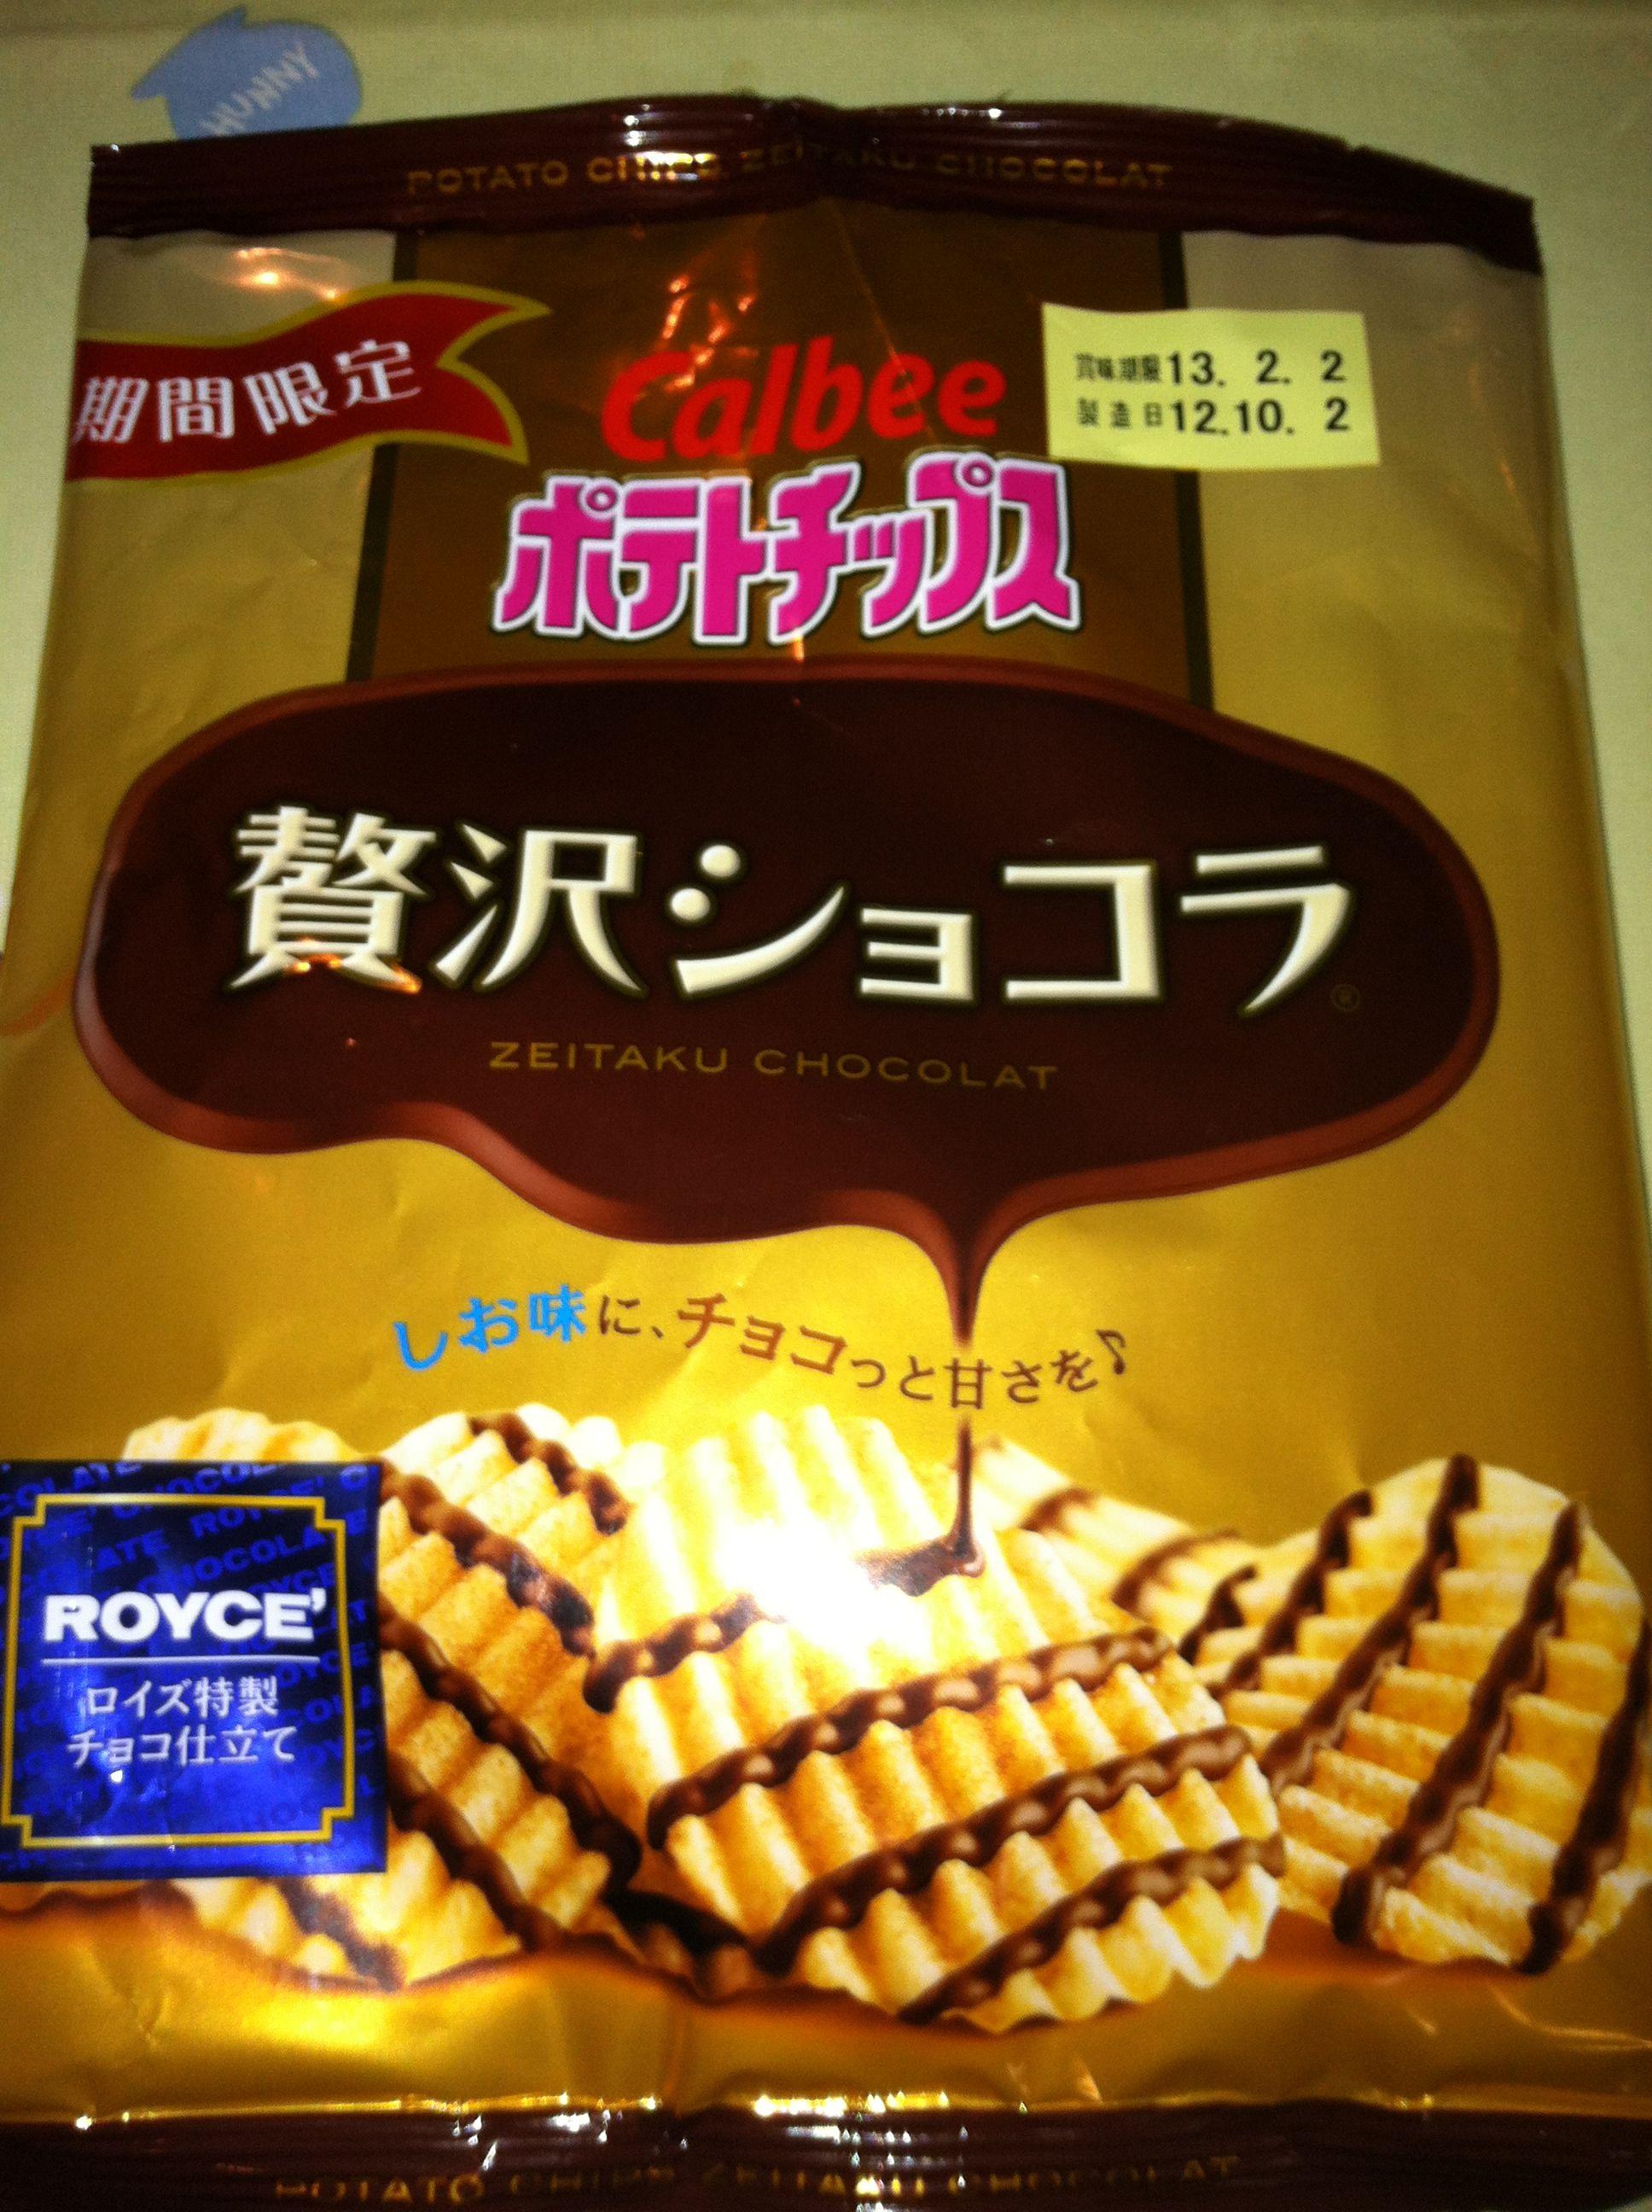 Calbee Chocolate Covered Potato Chips Japan Japanese